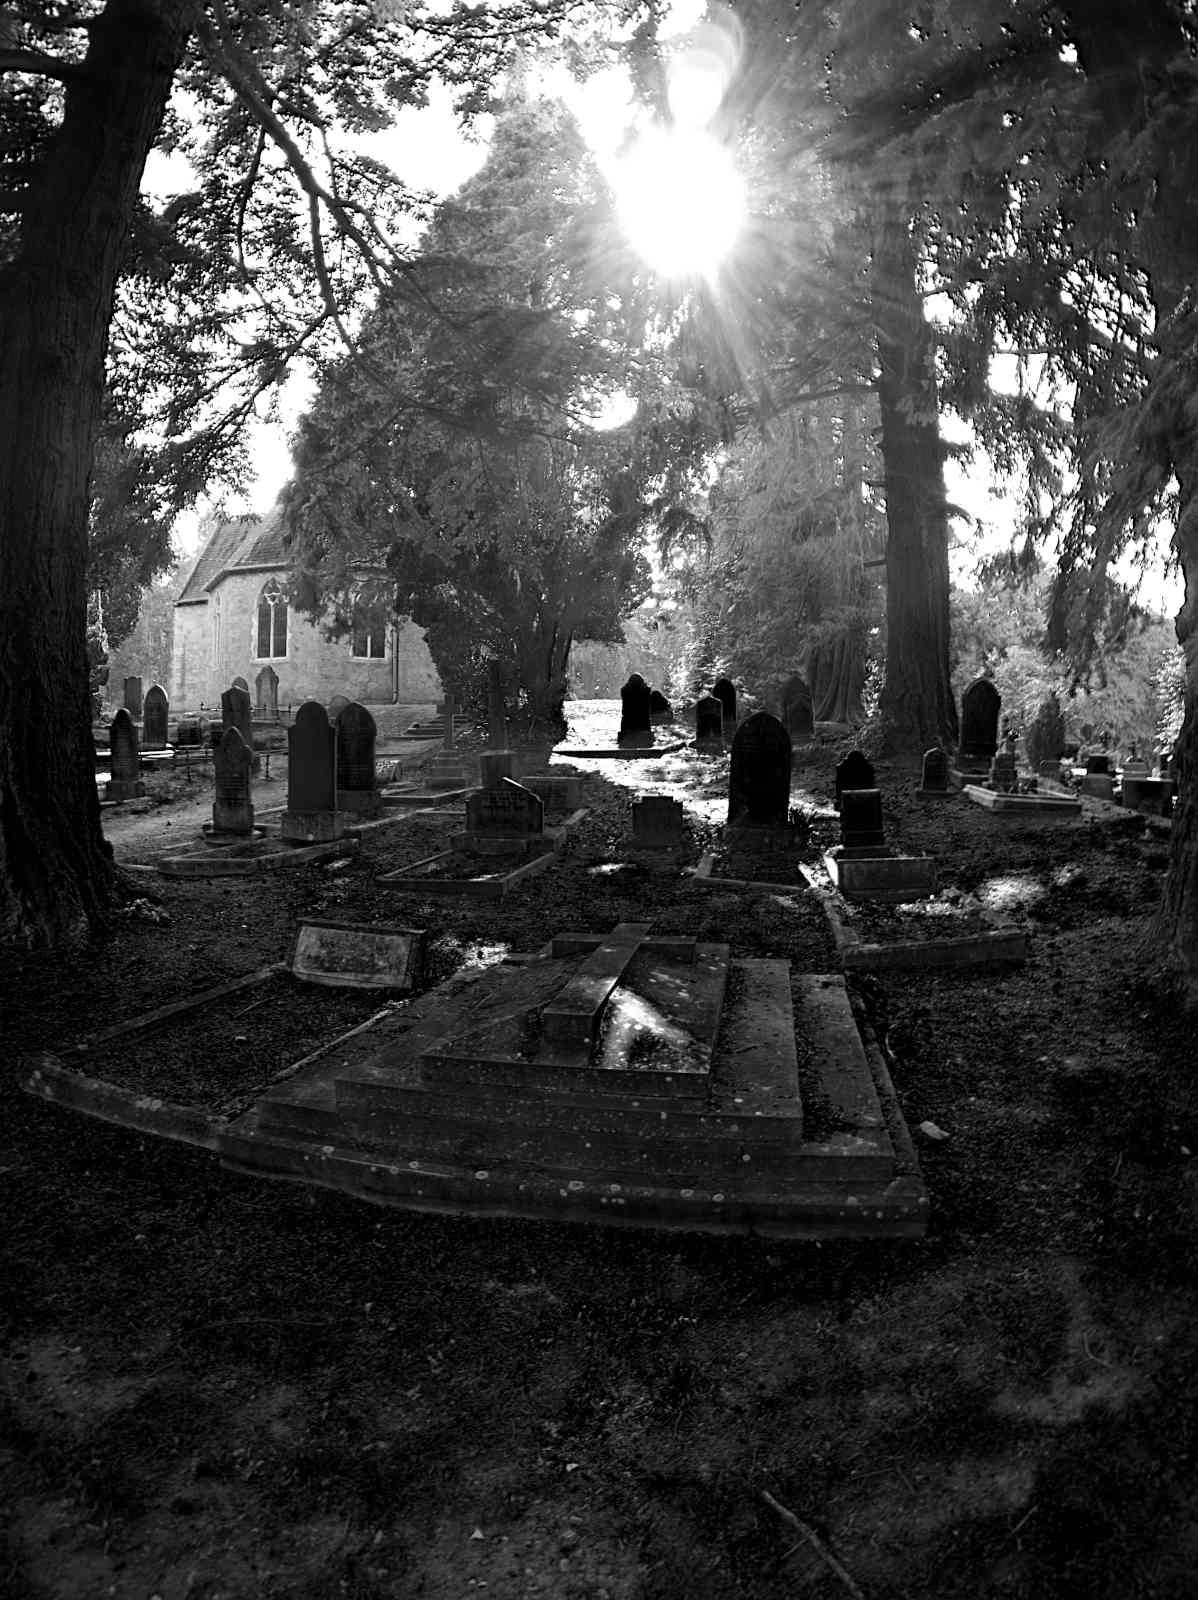 Friedhof Enniskerry 06, Olympus PEN E-PL7